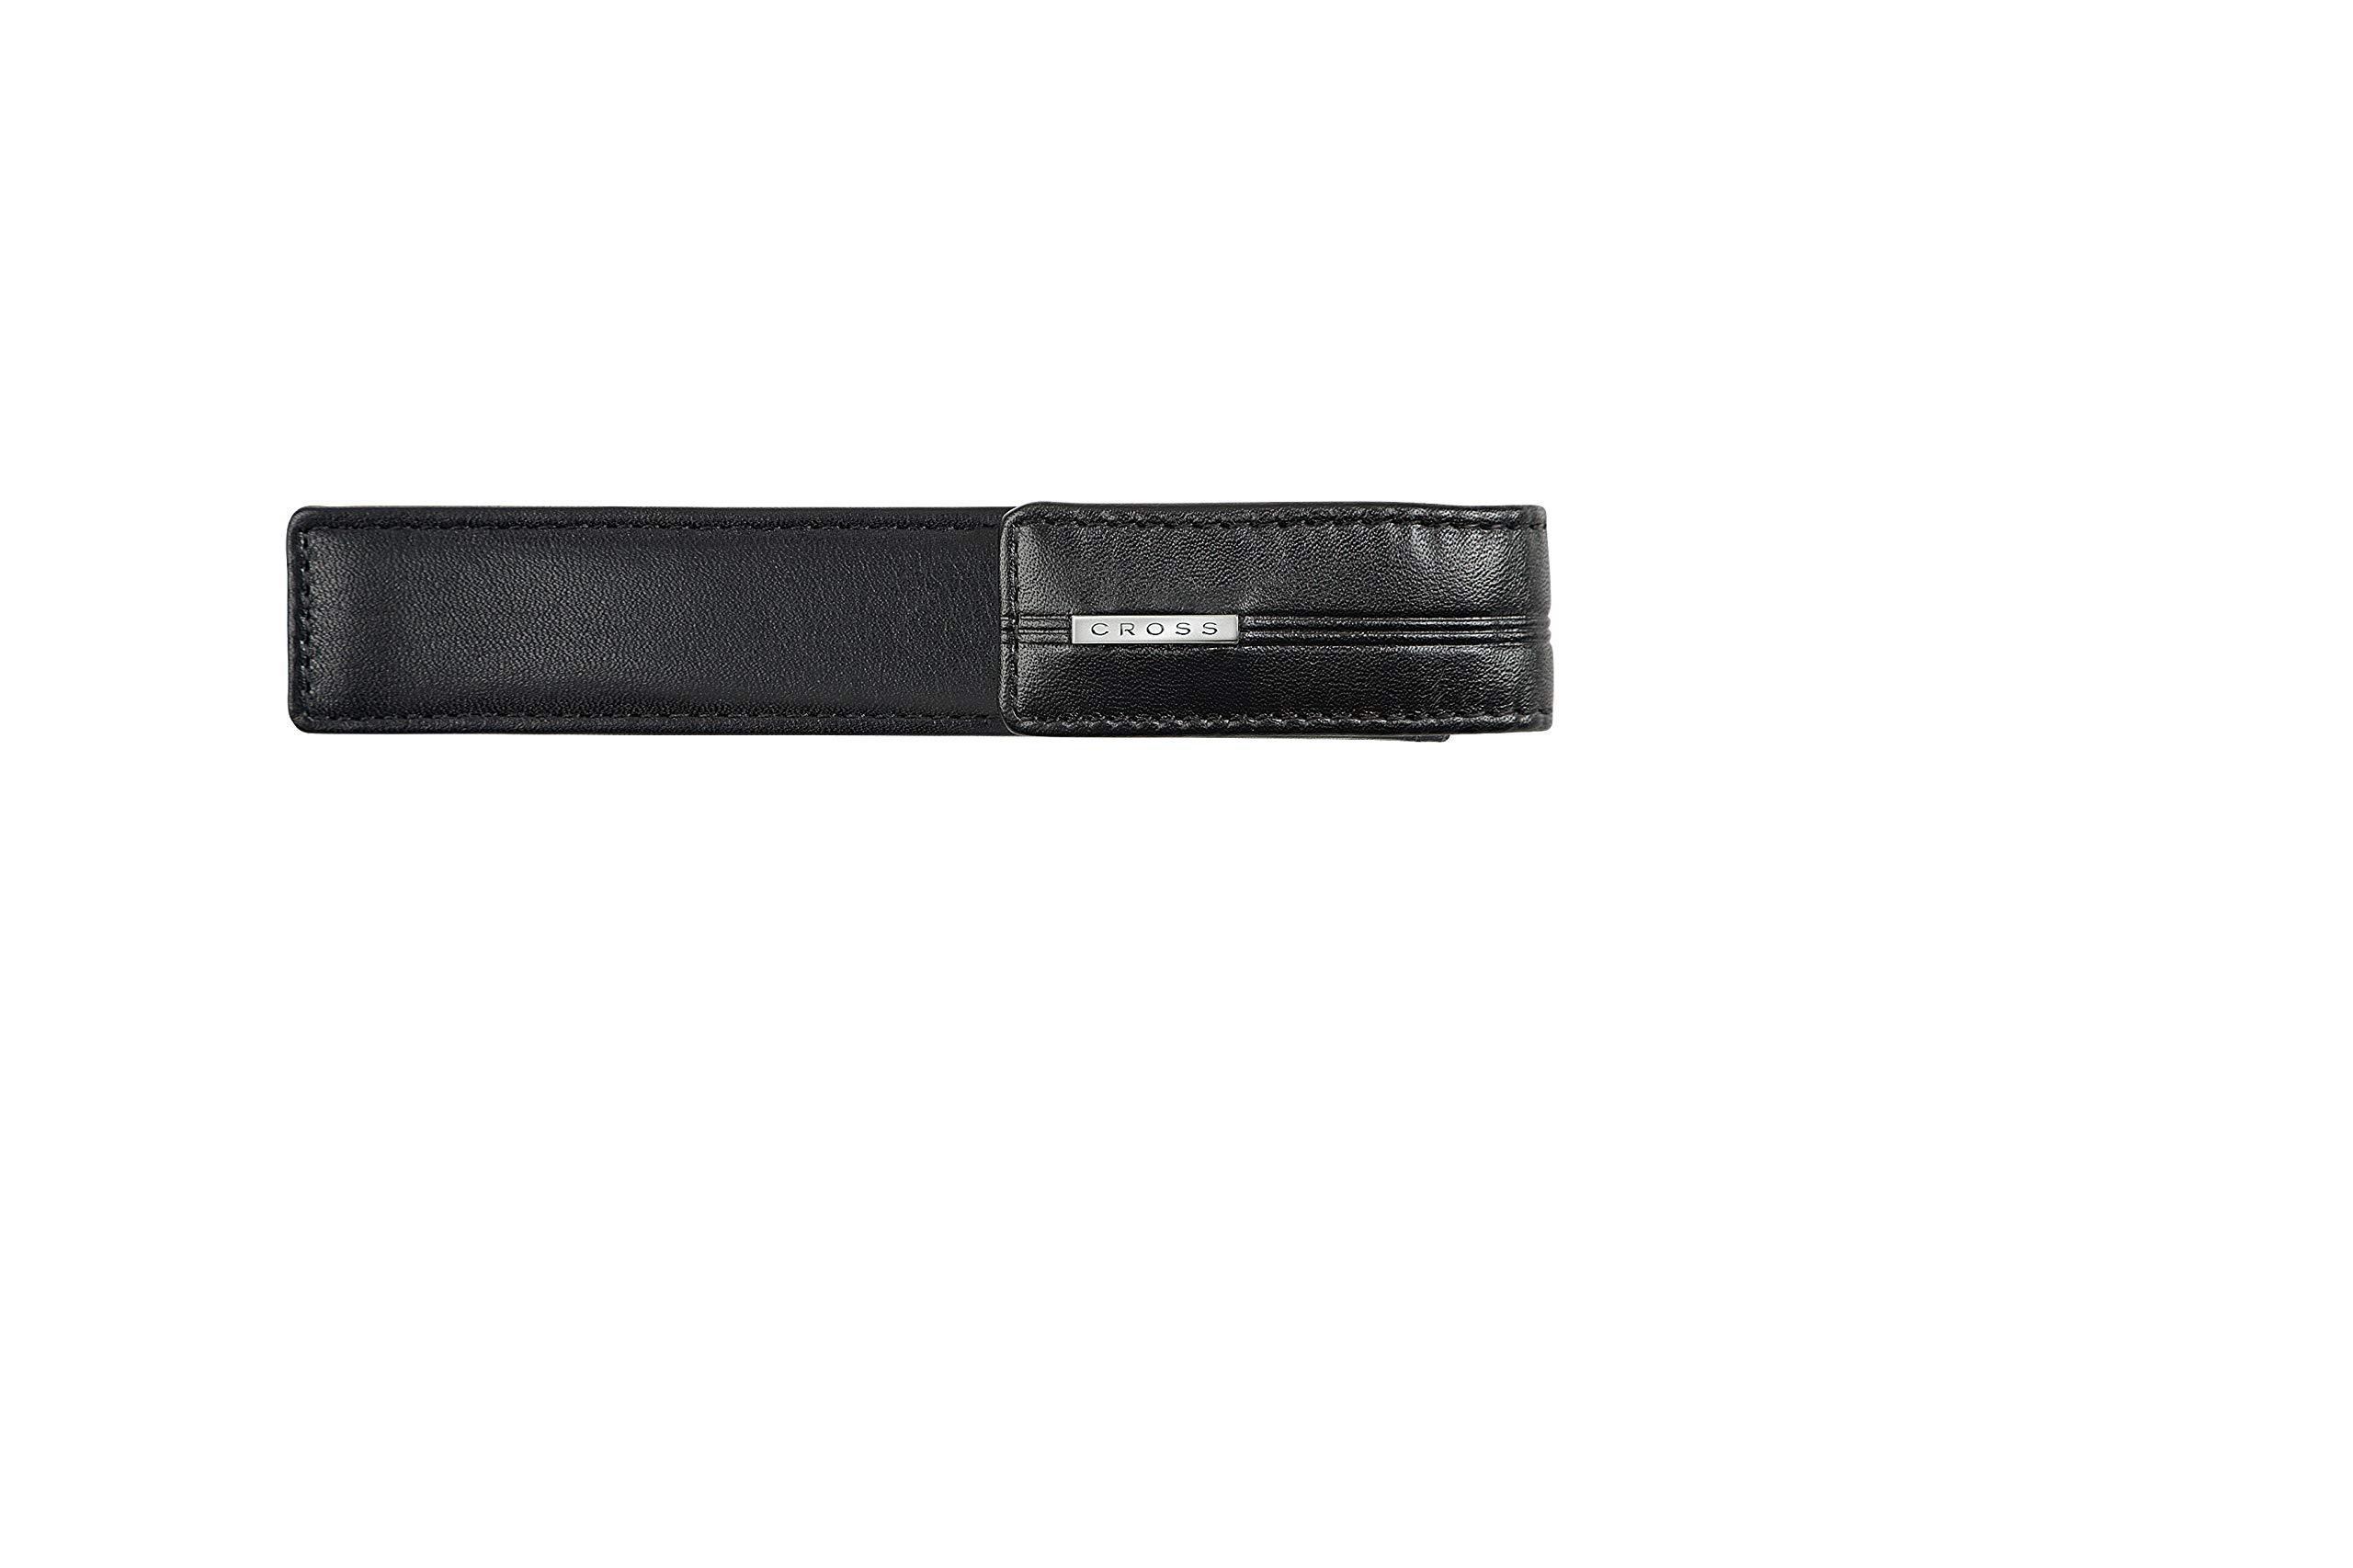 Cross Classic Century Single Pen Case Black Leather (pen not included)